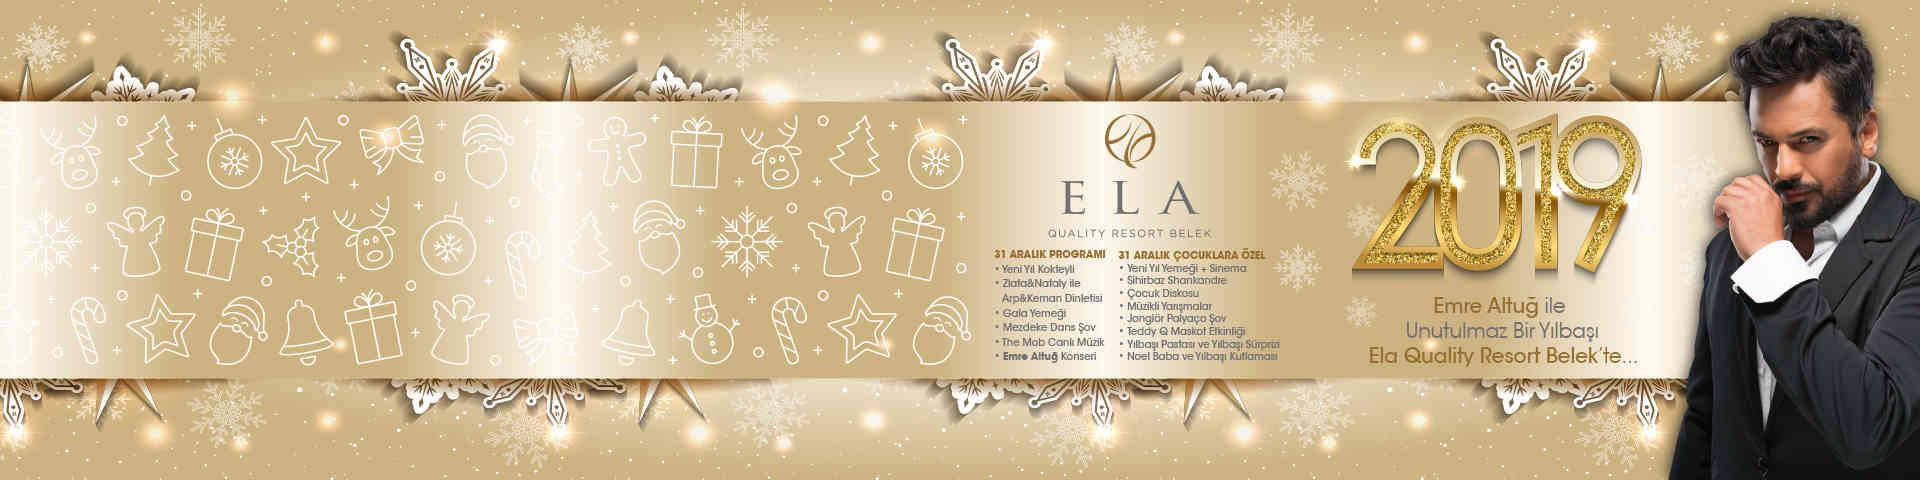 Ela Quality Emre Altuğ Yılbaşı Galası